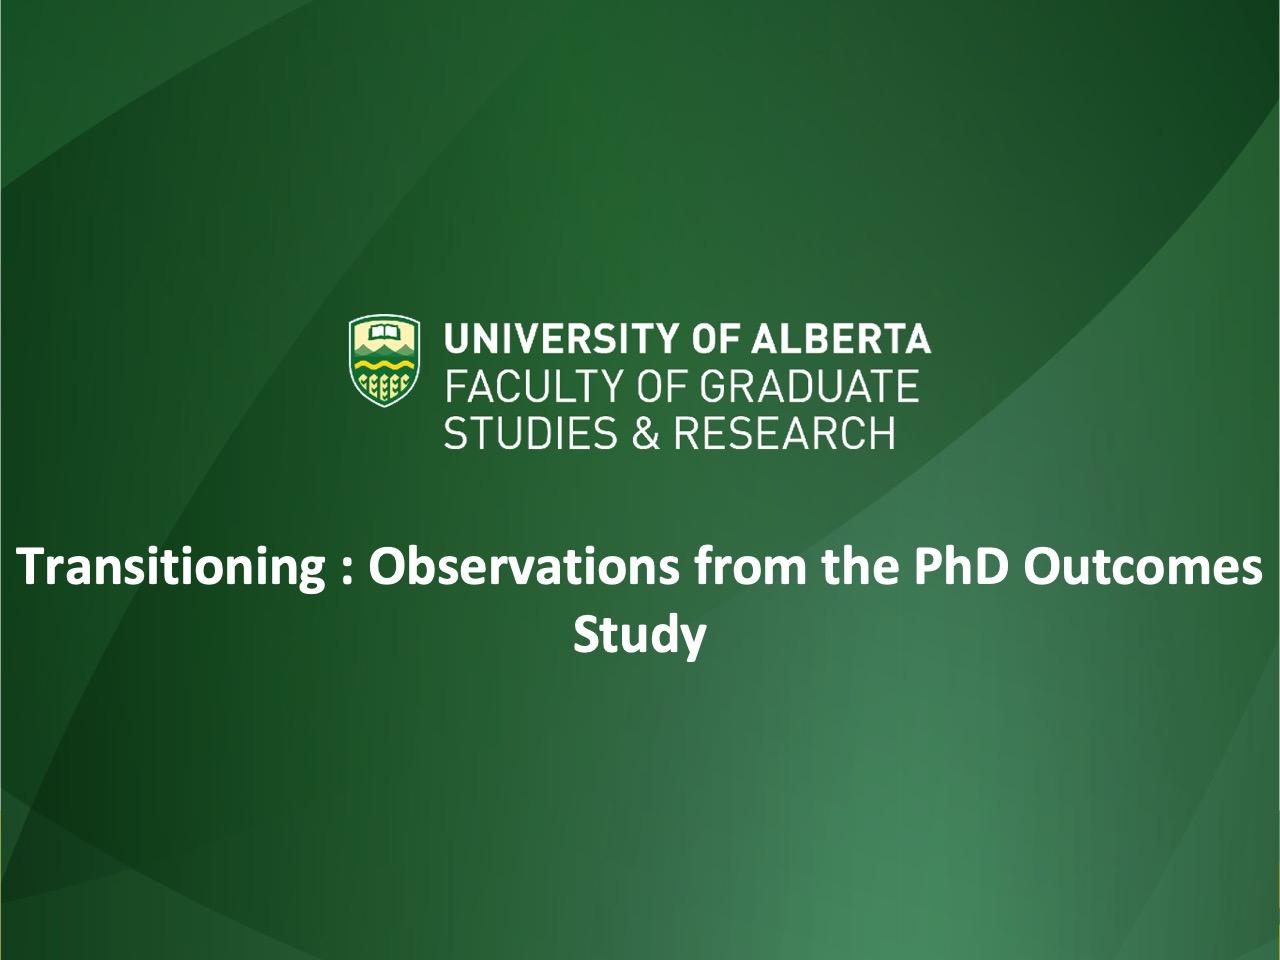 PhD Alumni Study and Identity